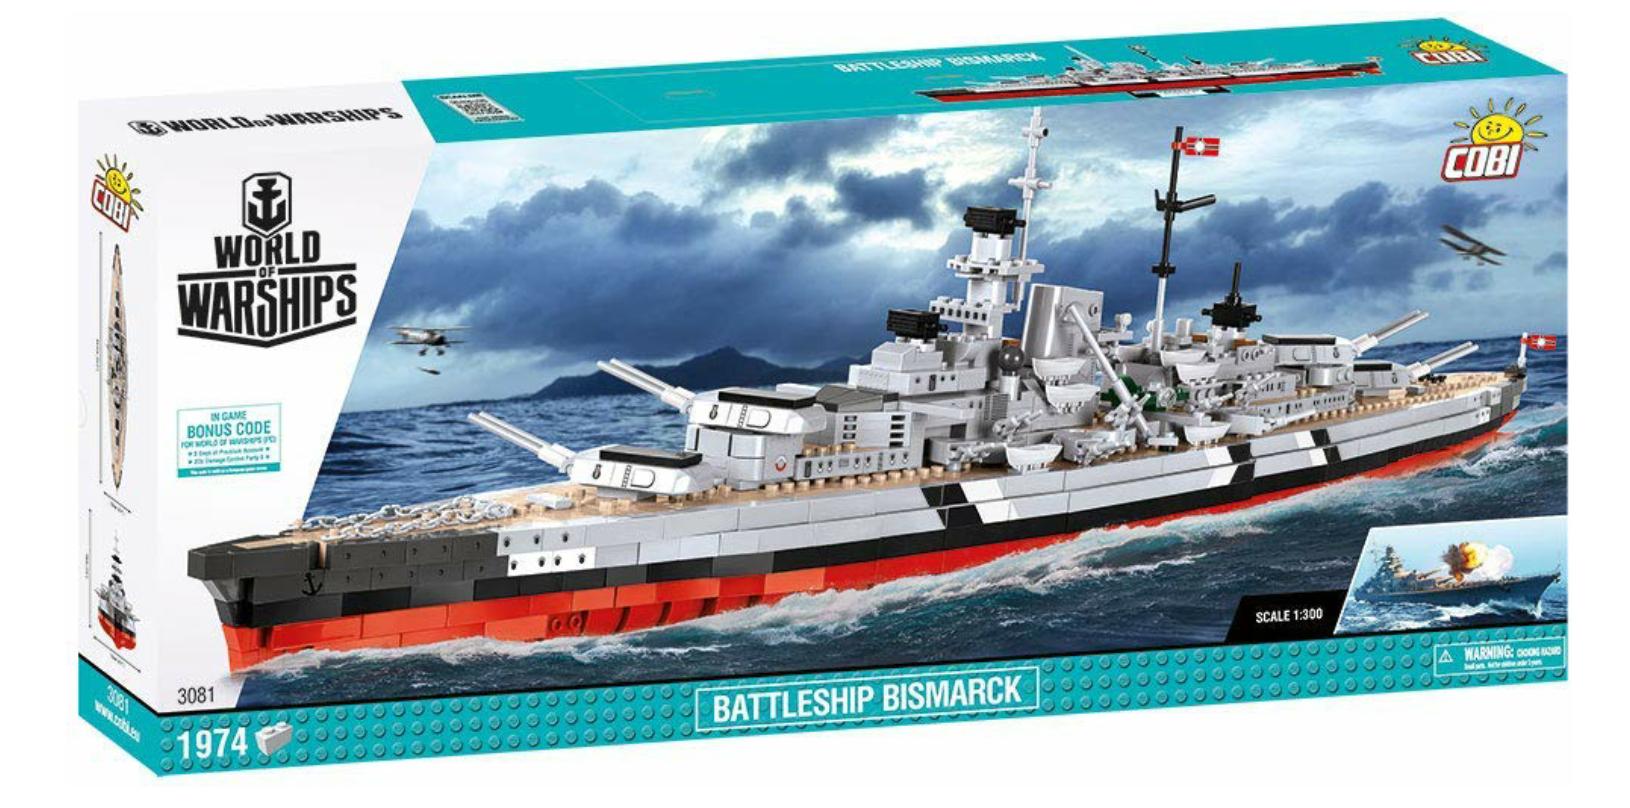 Cobi (3081) World of Warships Battleship Bismarck Limited Edition inkl. Bonus-Code (Lego-kompatibel)